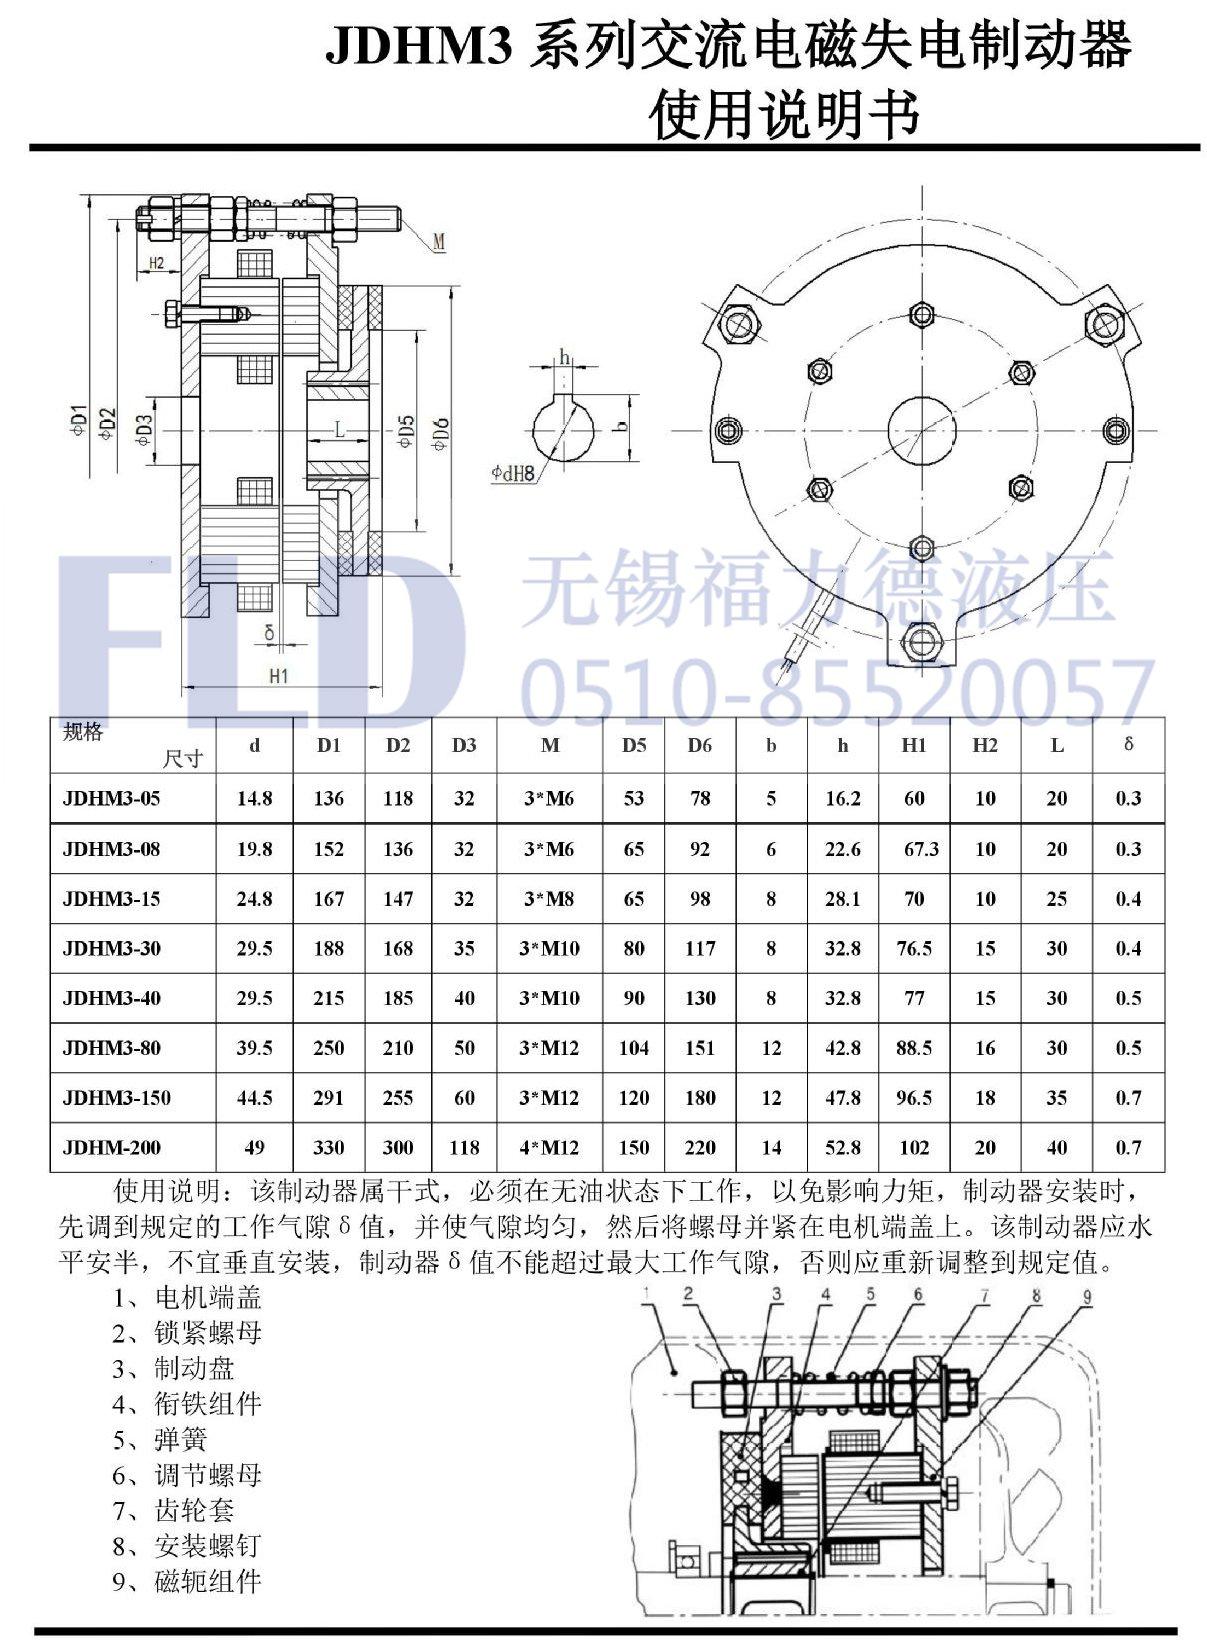 jdhm3-80,交流电磁失电制动器